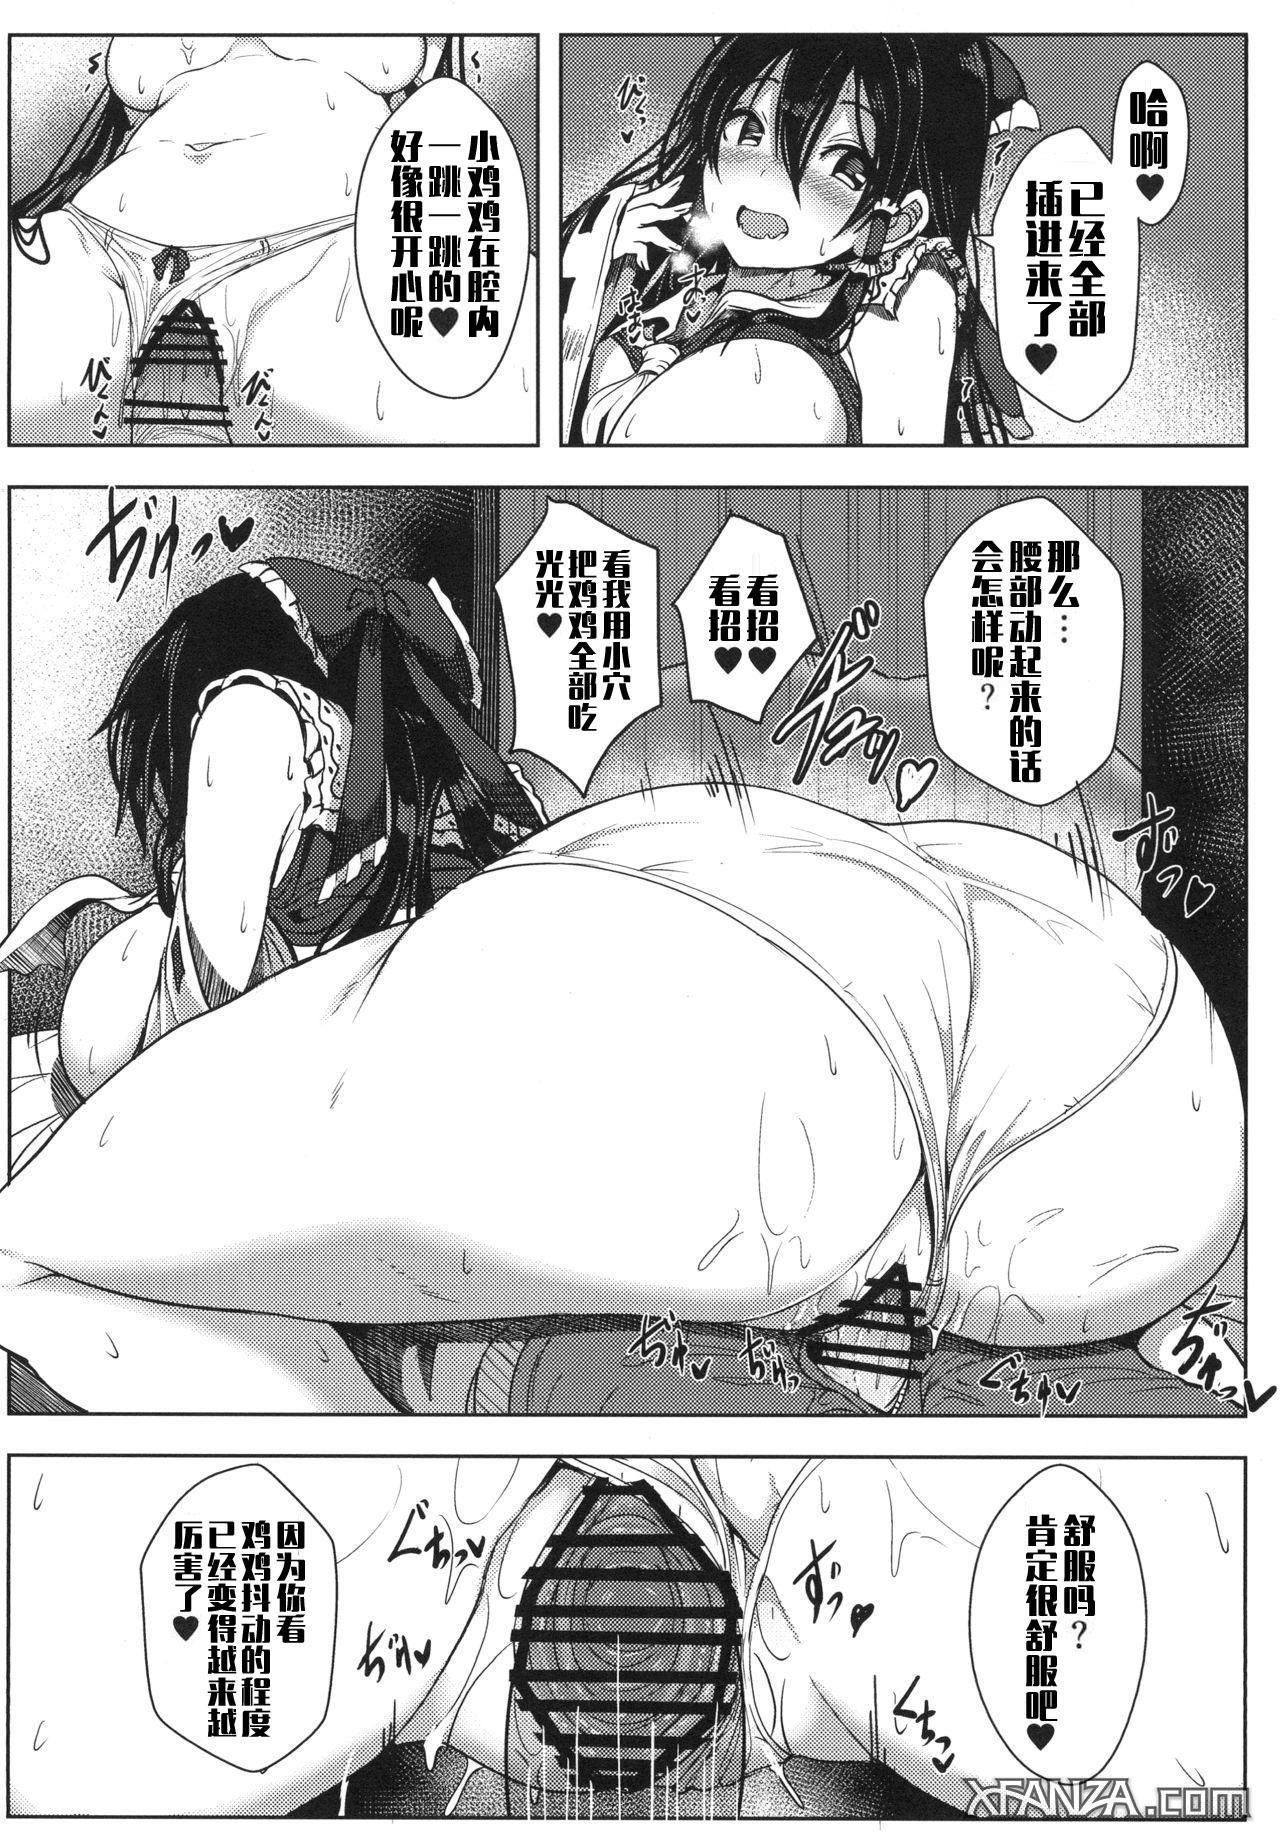 Reimu-san no Ecchi na Hon 9